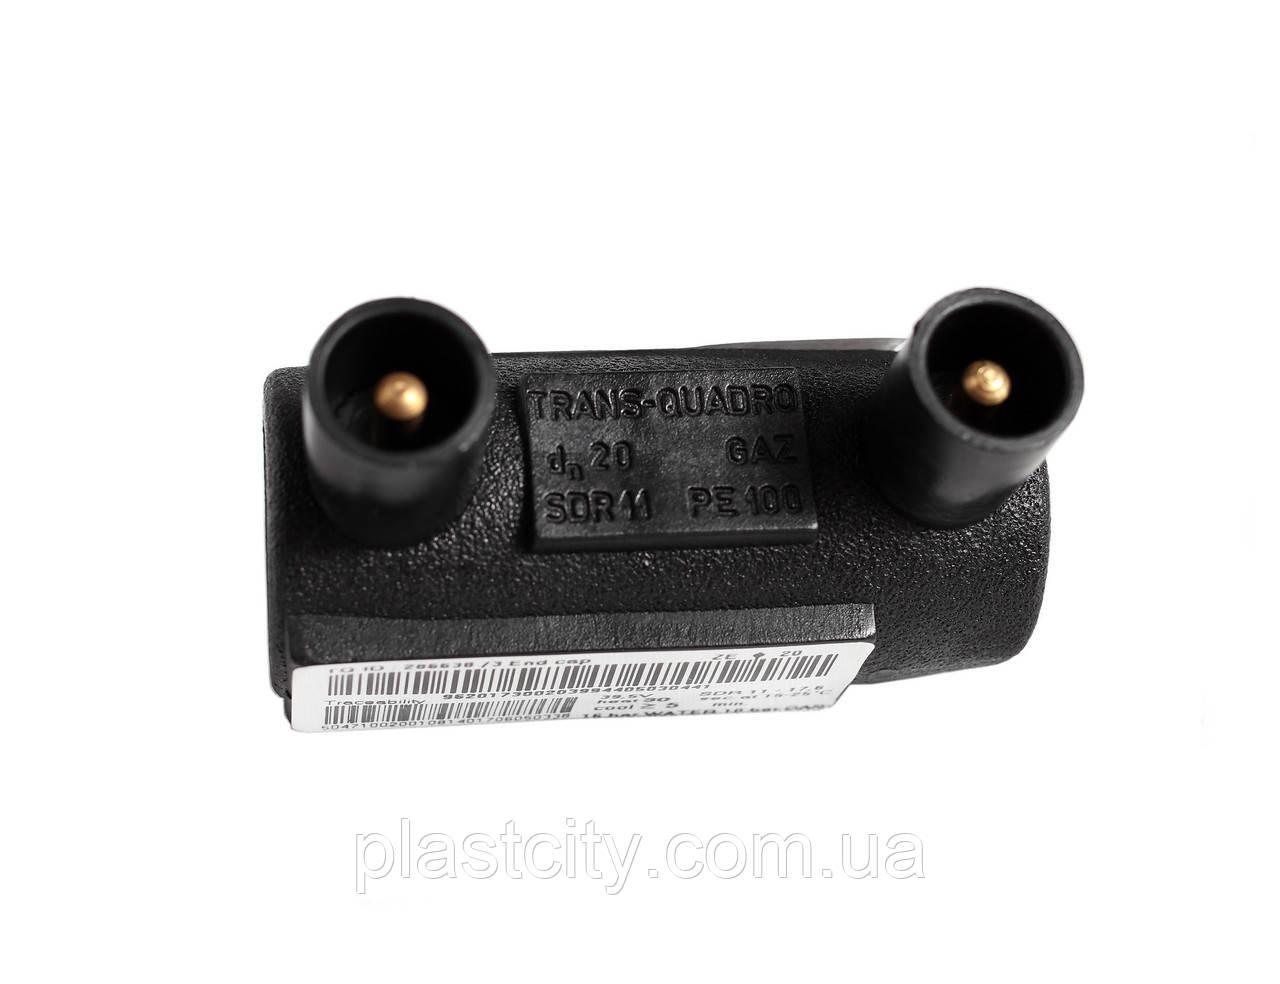 Муфта терморезисторная 225 мм ПЭ100 SDR11